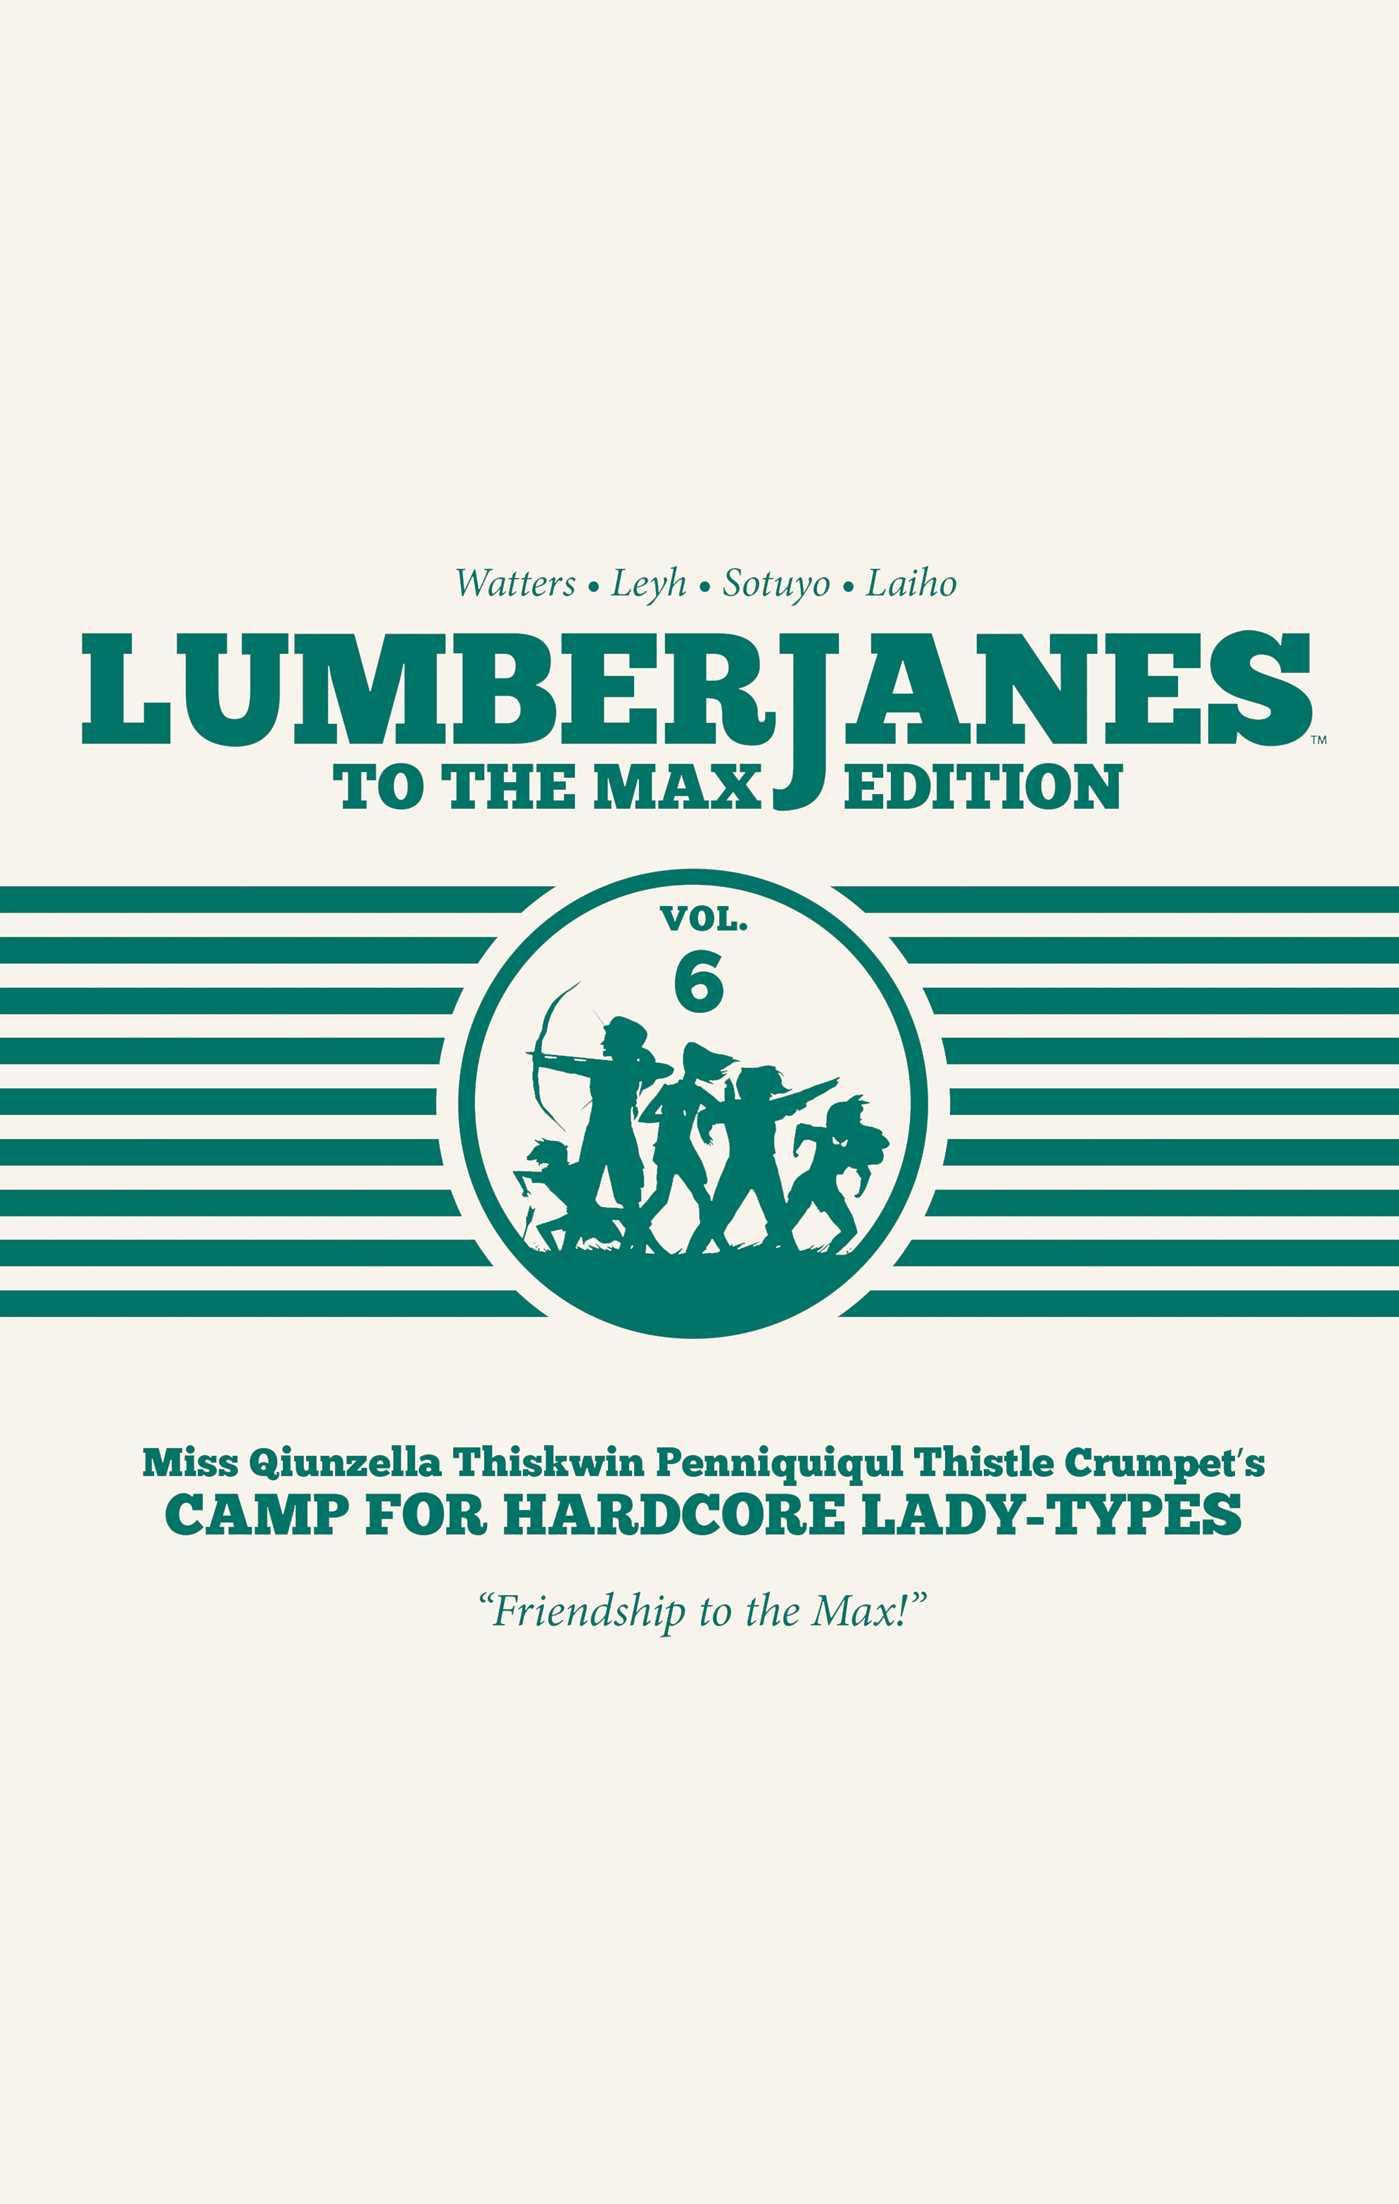 Lumberjanes: To the Max Vol. 6